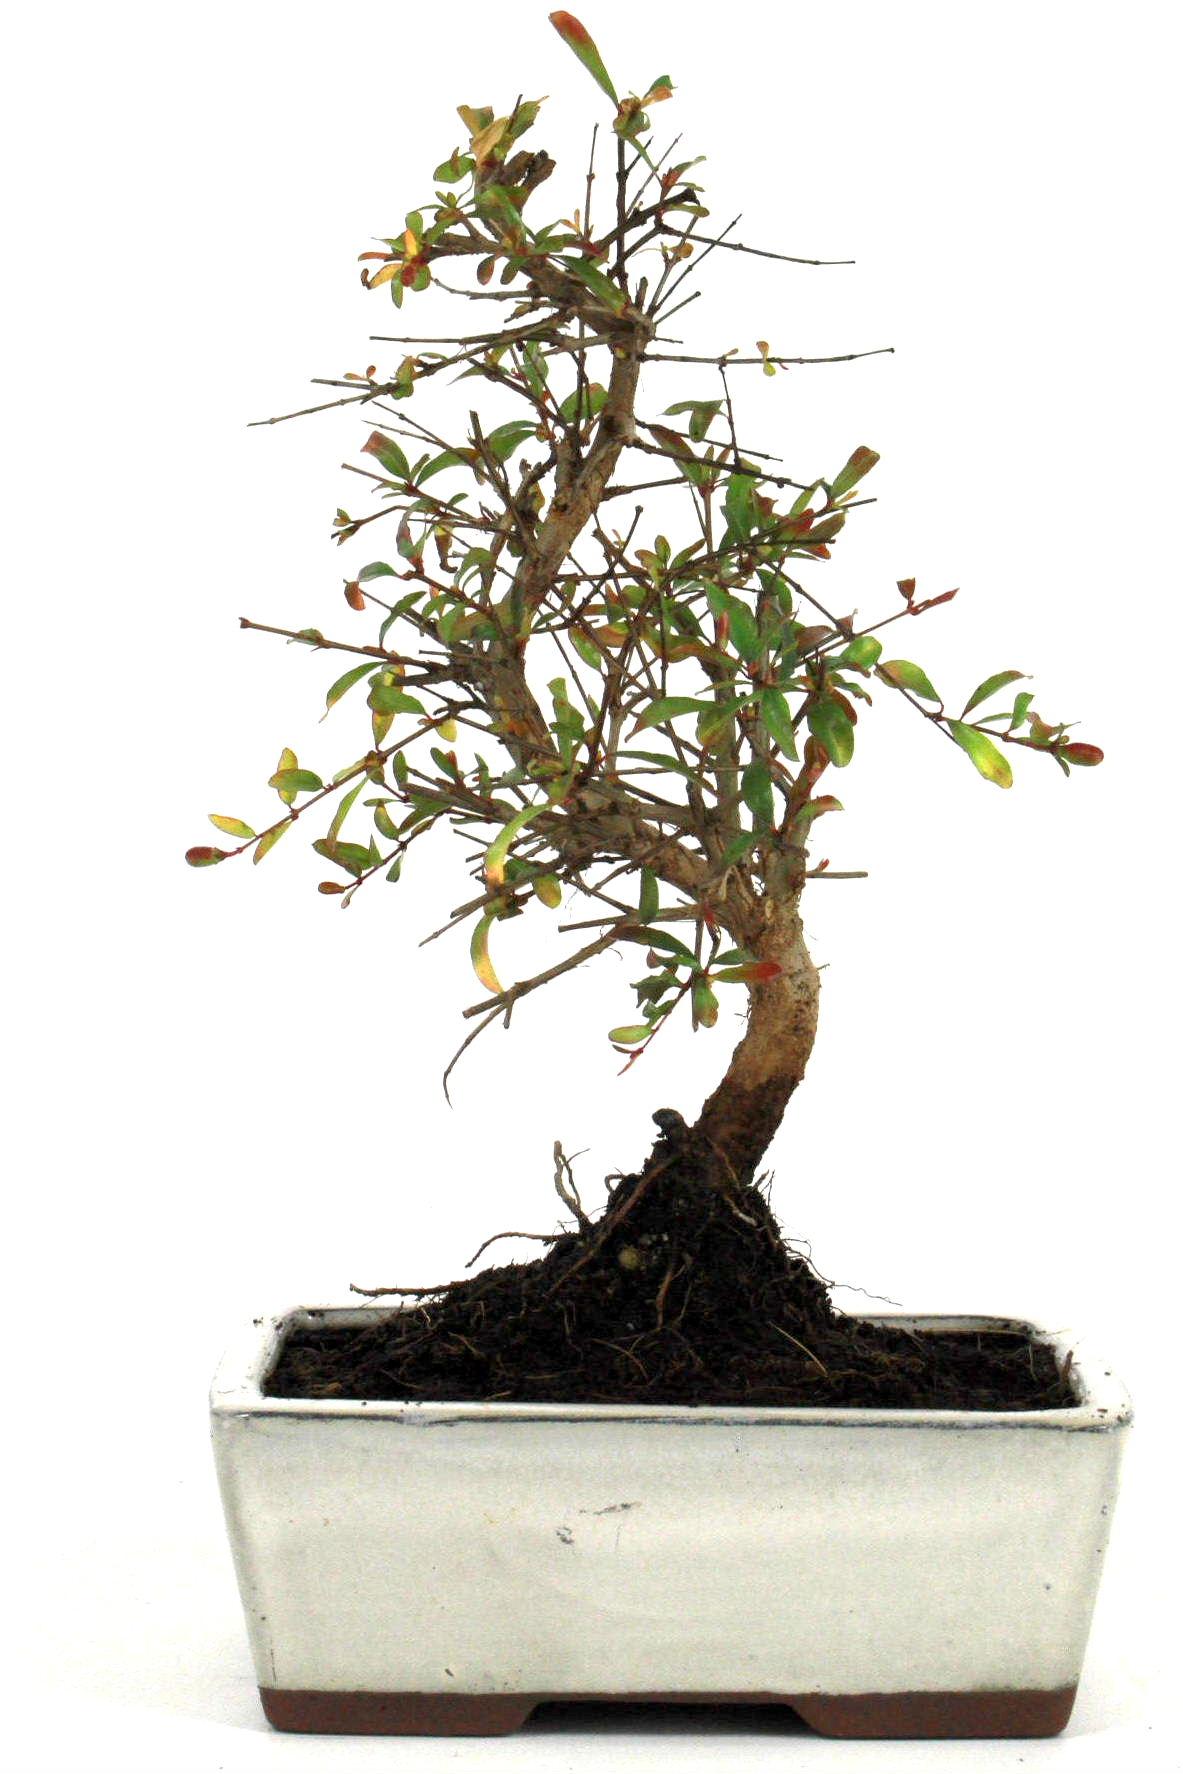 granatapfel bonsai 25 30 cm 1625 bei oyaki bonsai kaufen. Black Bedroom Furniture Sets. Home Design Ideas